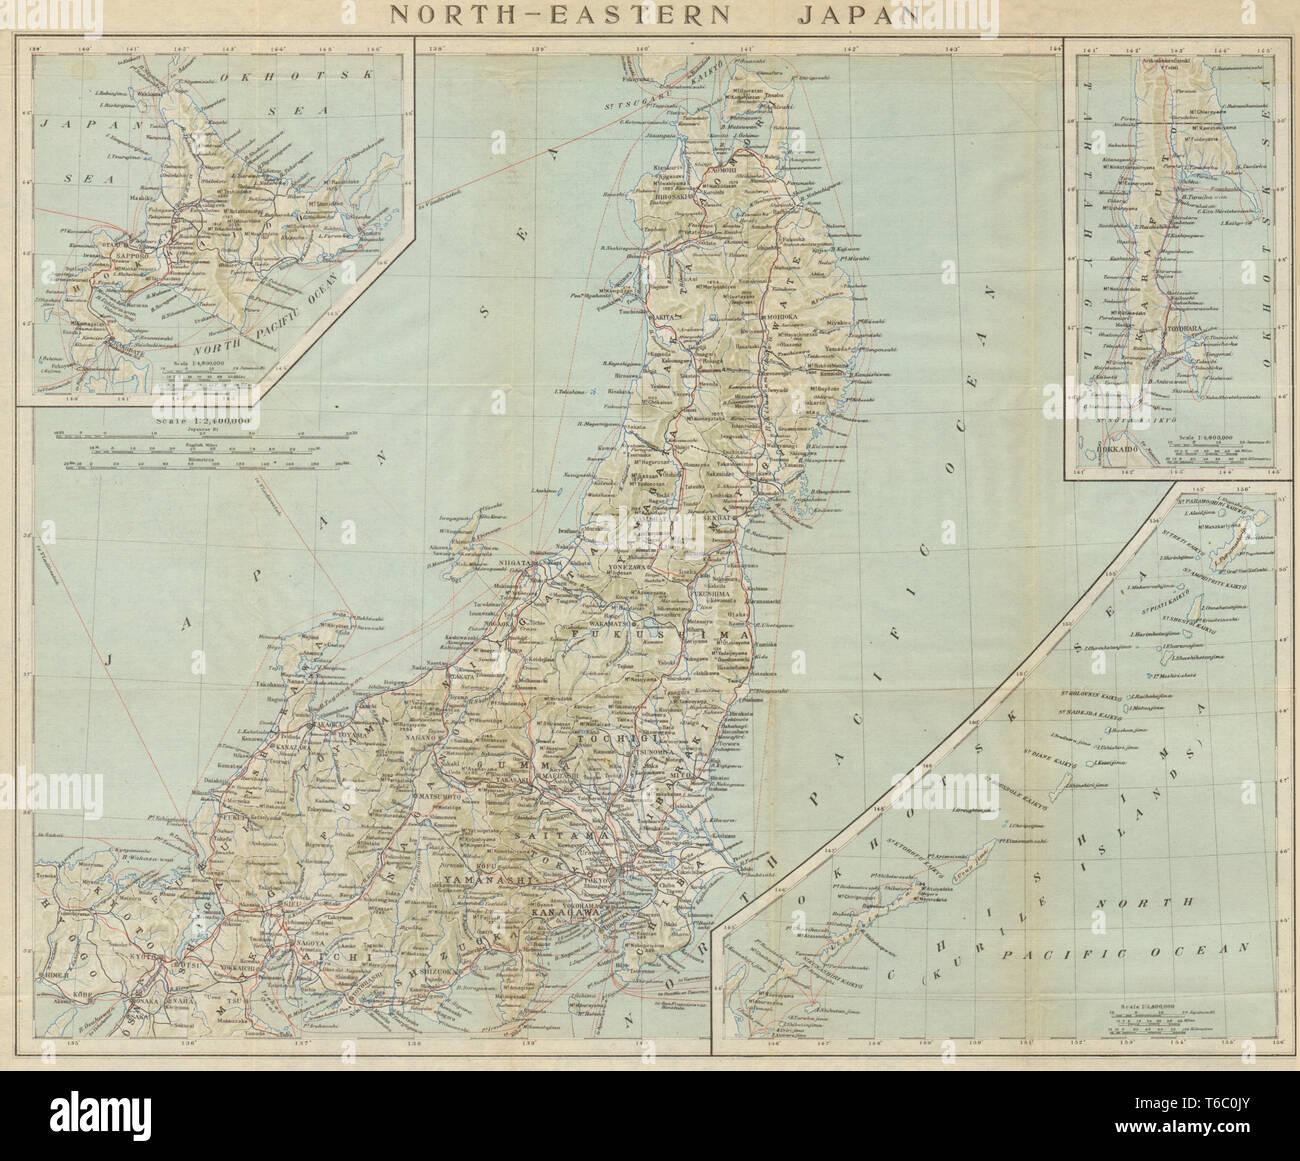 North-Eastern Japan. Honshu, Hokkaido, Sakhalin & Kurile ...